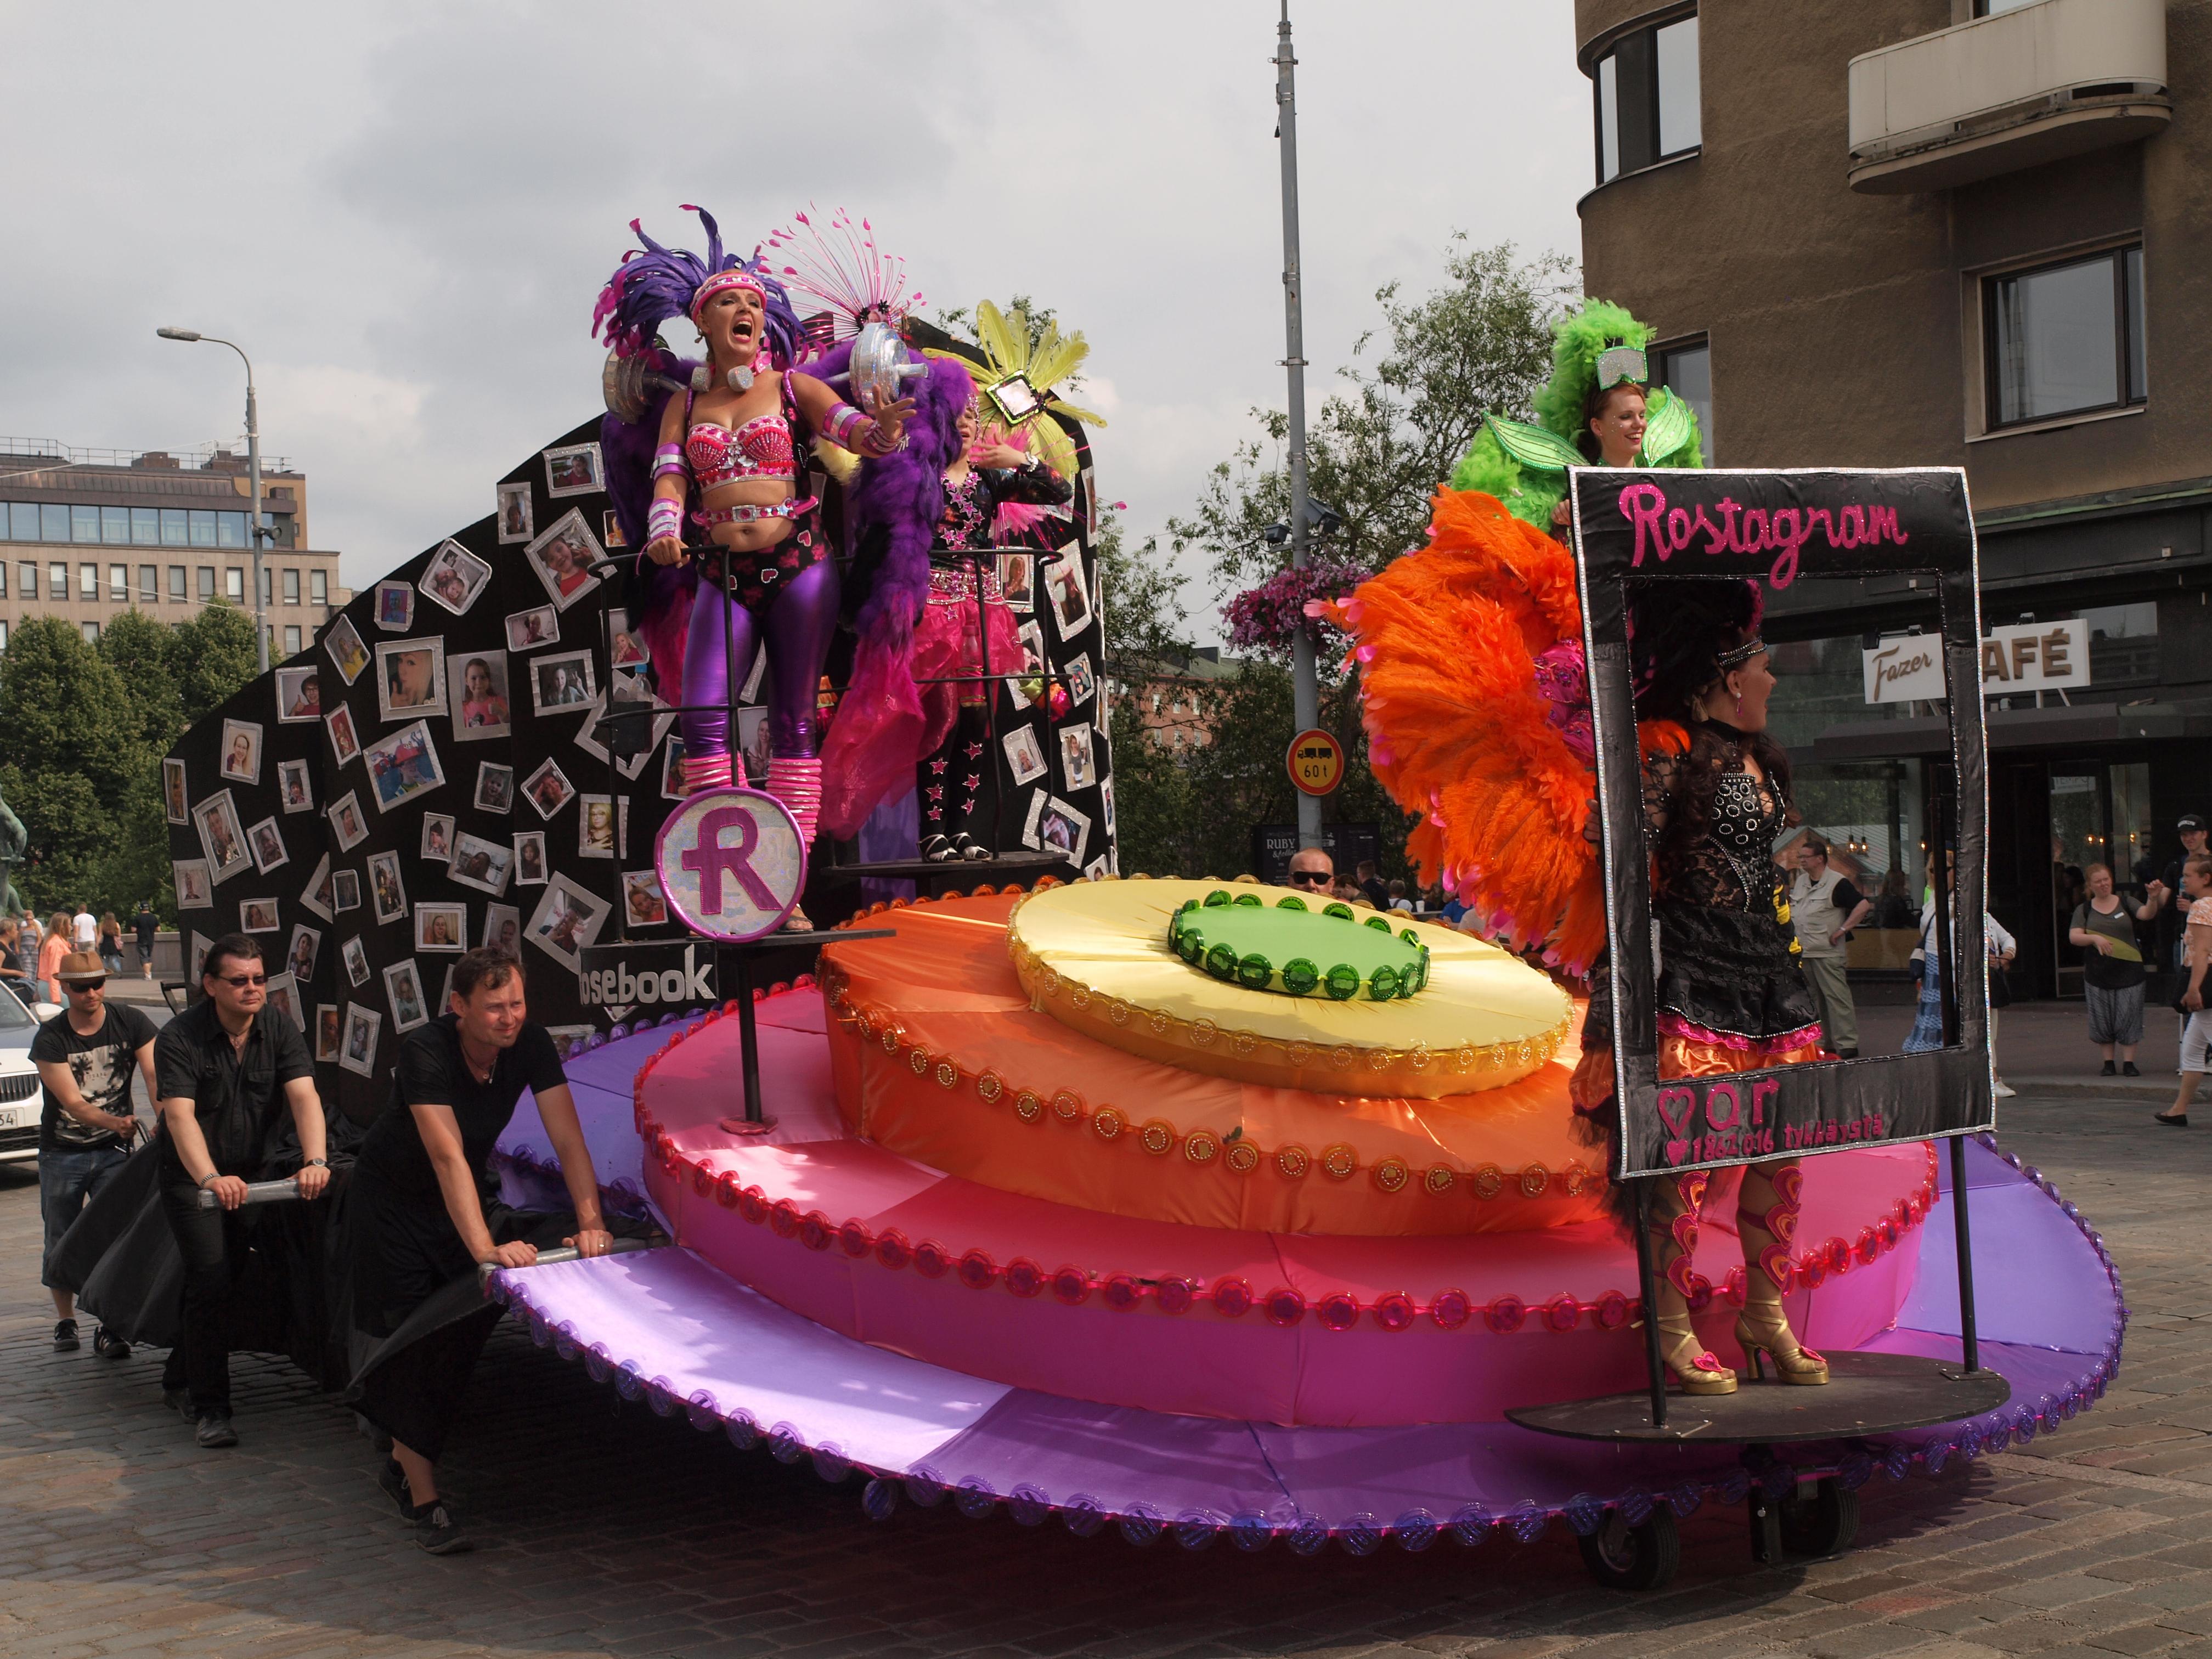 tampere festivaali 2016